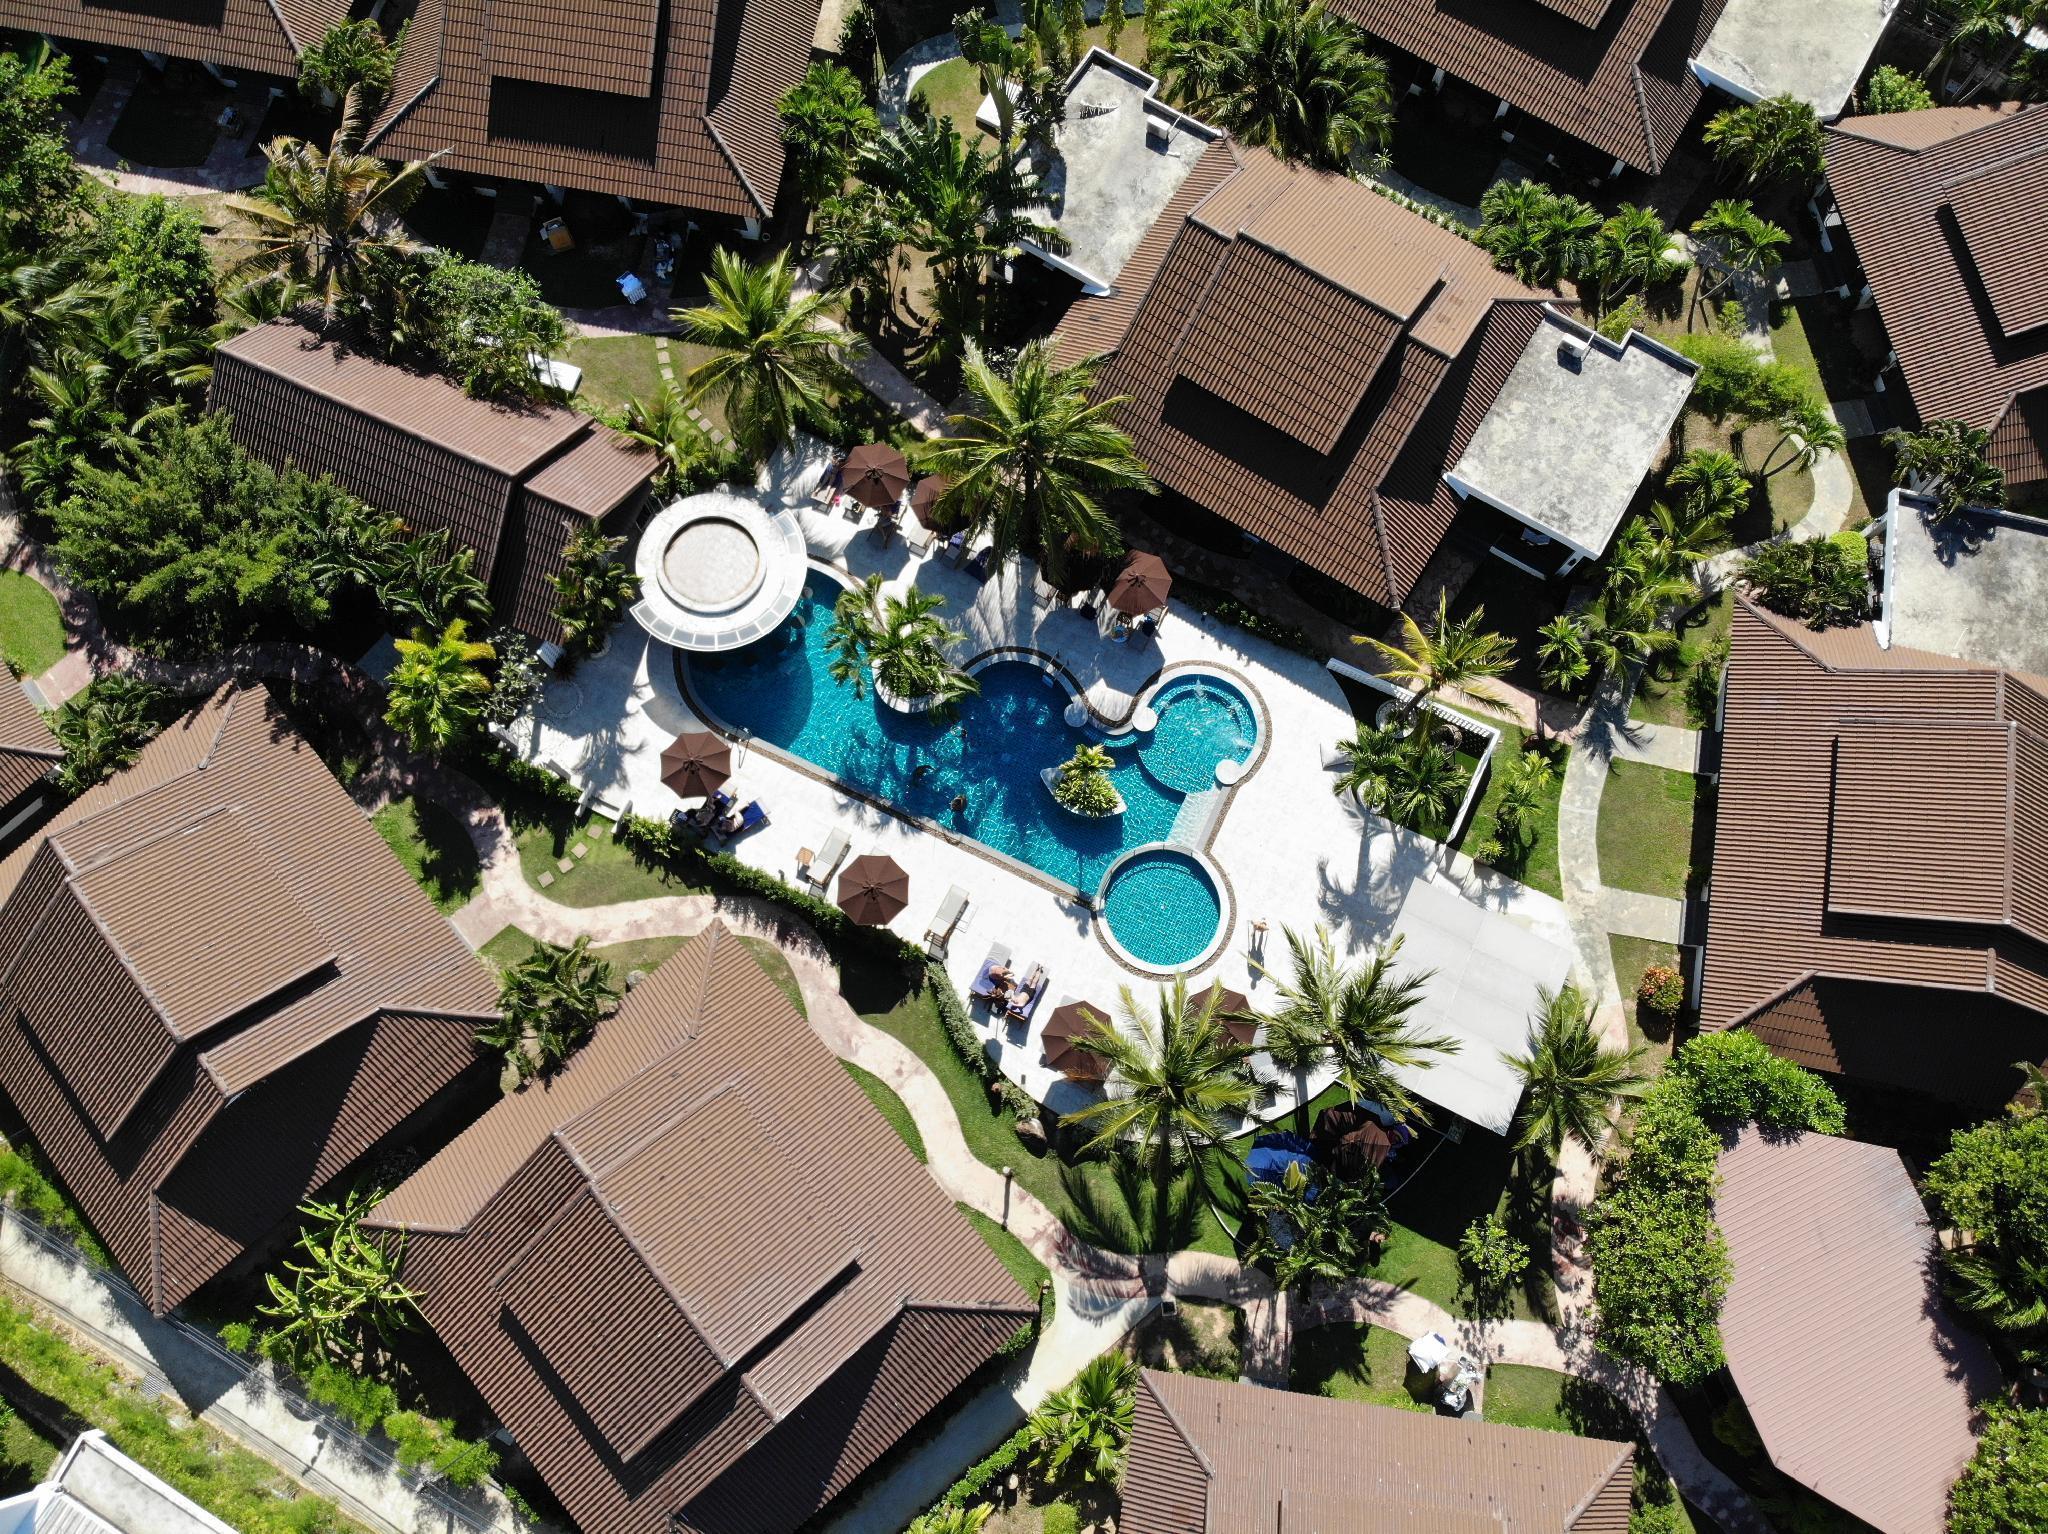 Kata Lucky Villa & Pool Access กะตะ ลักกี้ วิลลา แอนด์ พูล แอคเซส